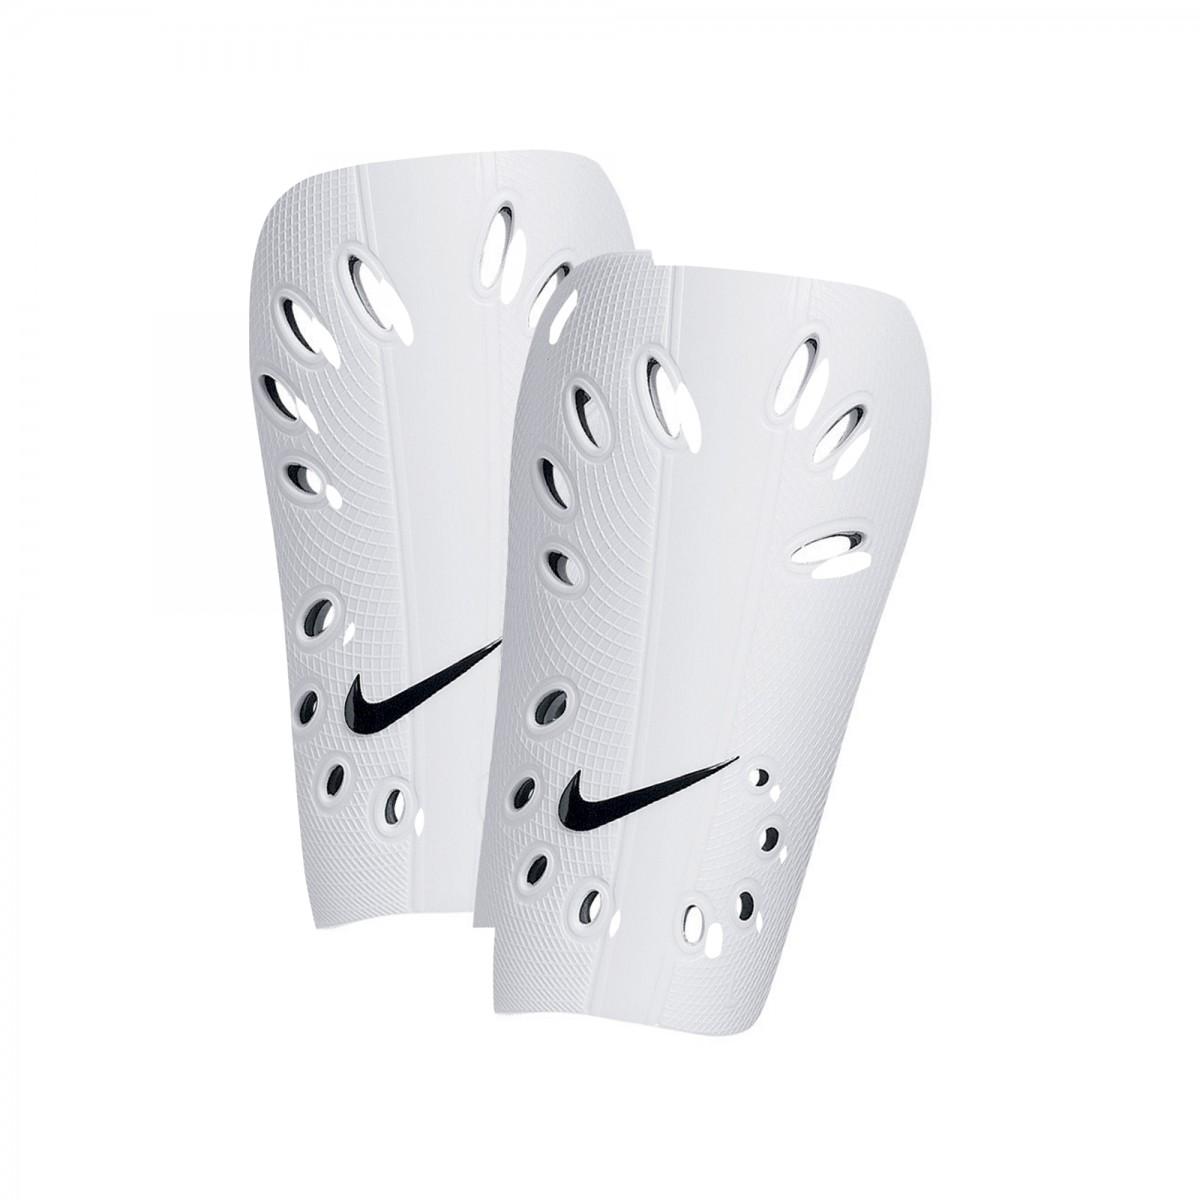 40180452d1 Bizz Store - Caneleira De Futebol Nike J Guard Branca Preta